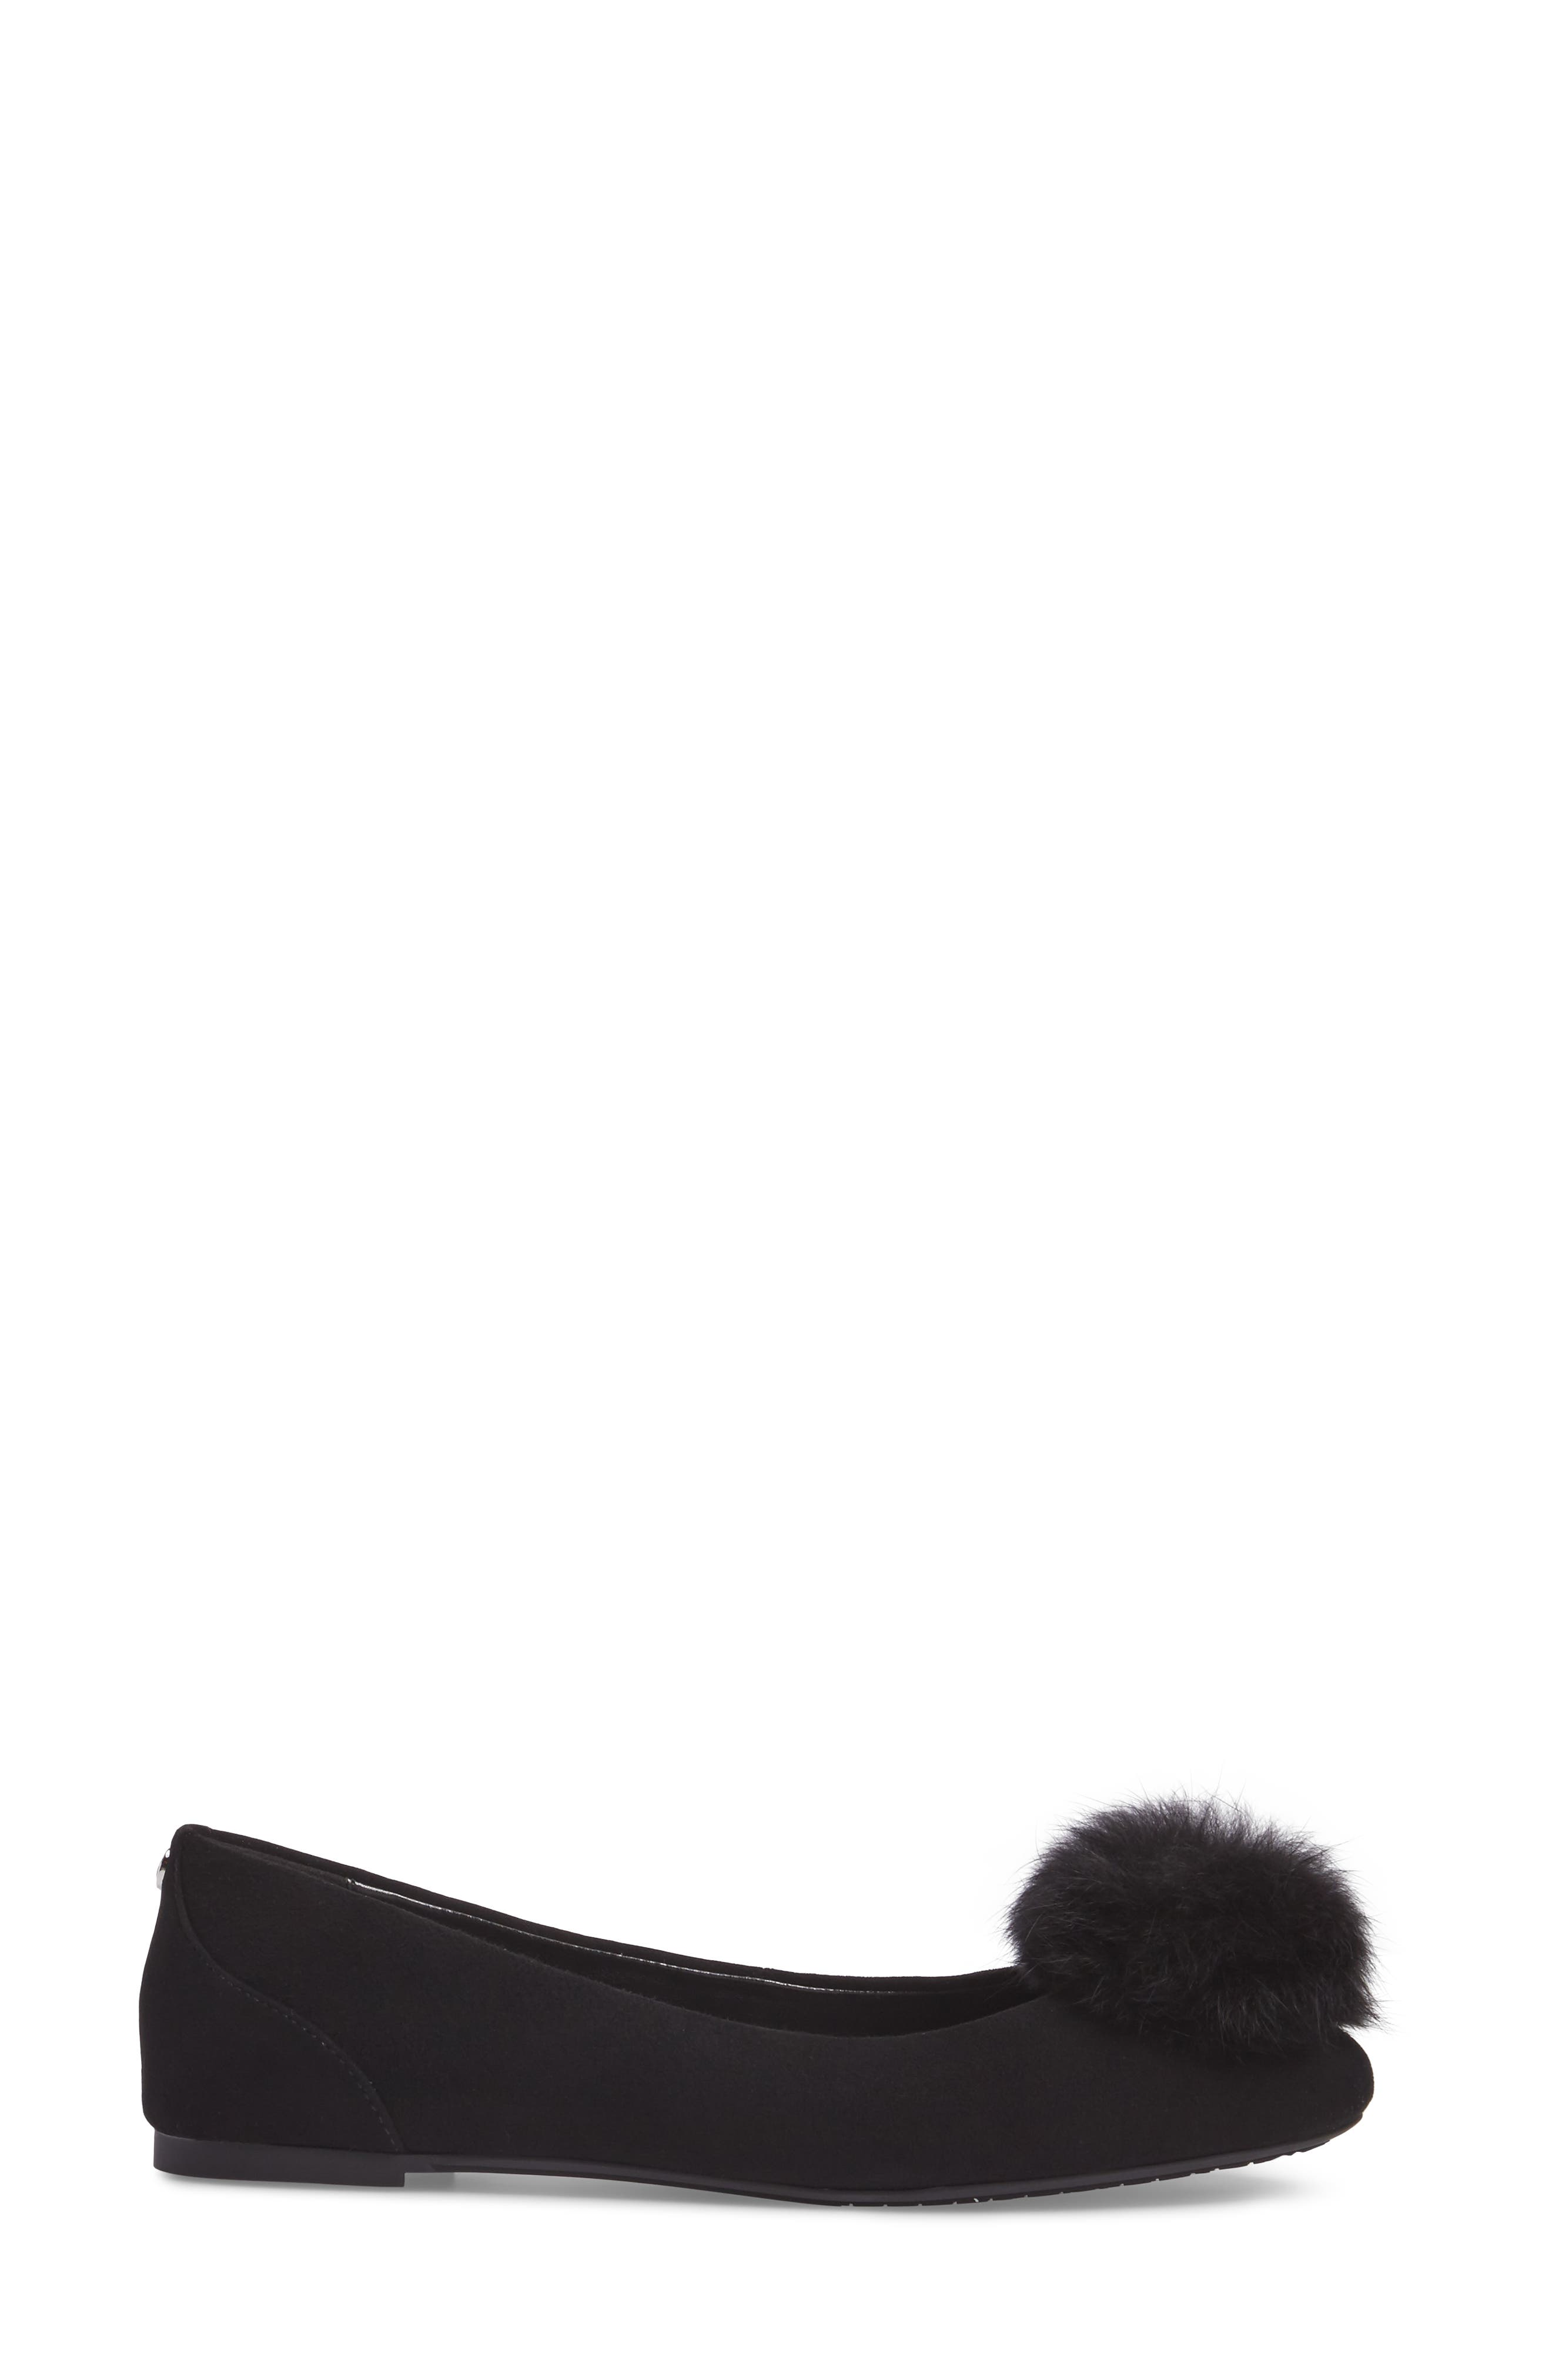 Remi Ballet Flat with Genuine Rabbit Fur Pom,                             Alternate thumbnail 3, color,                             001